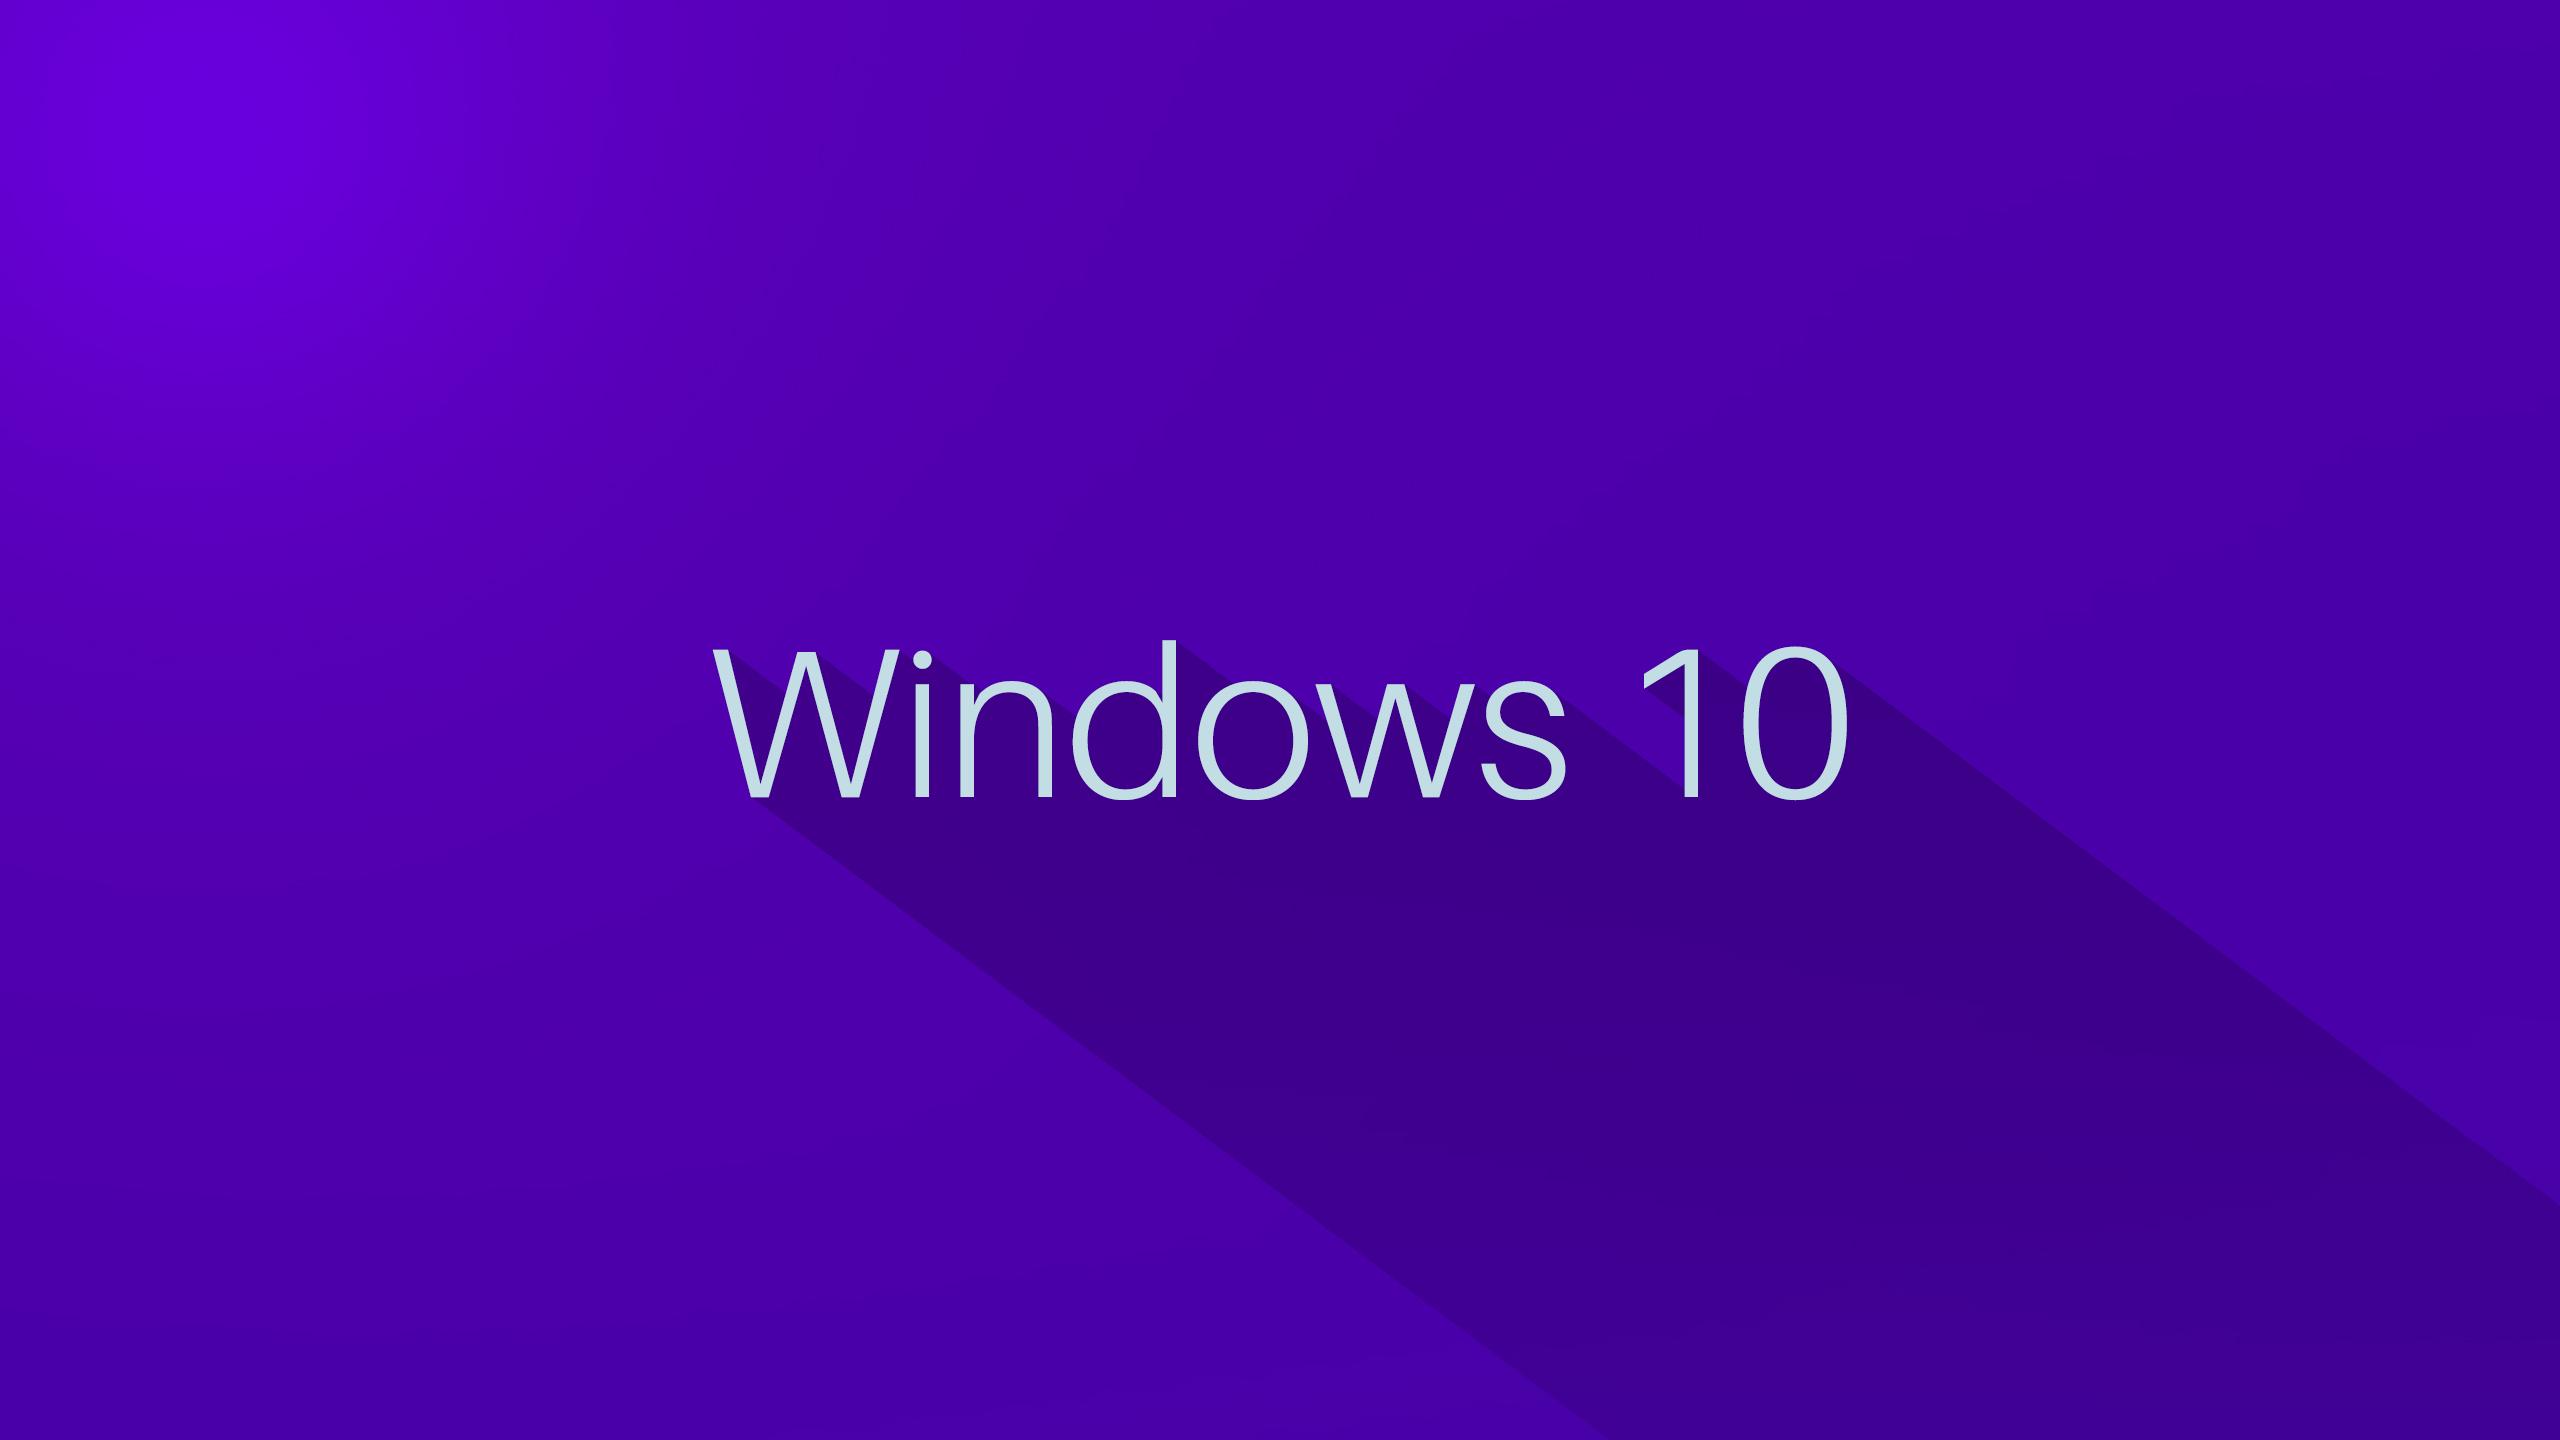 Windows 10 Flat Wallpaper WallpaperSafari